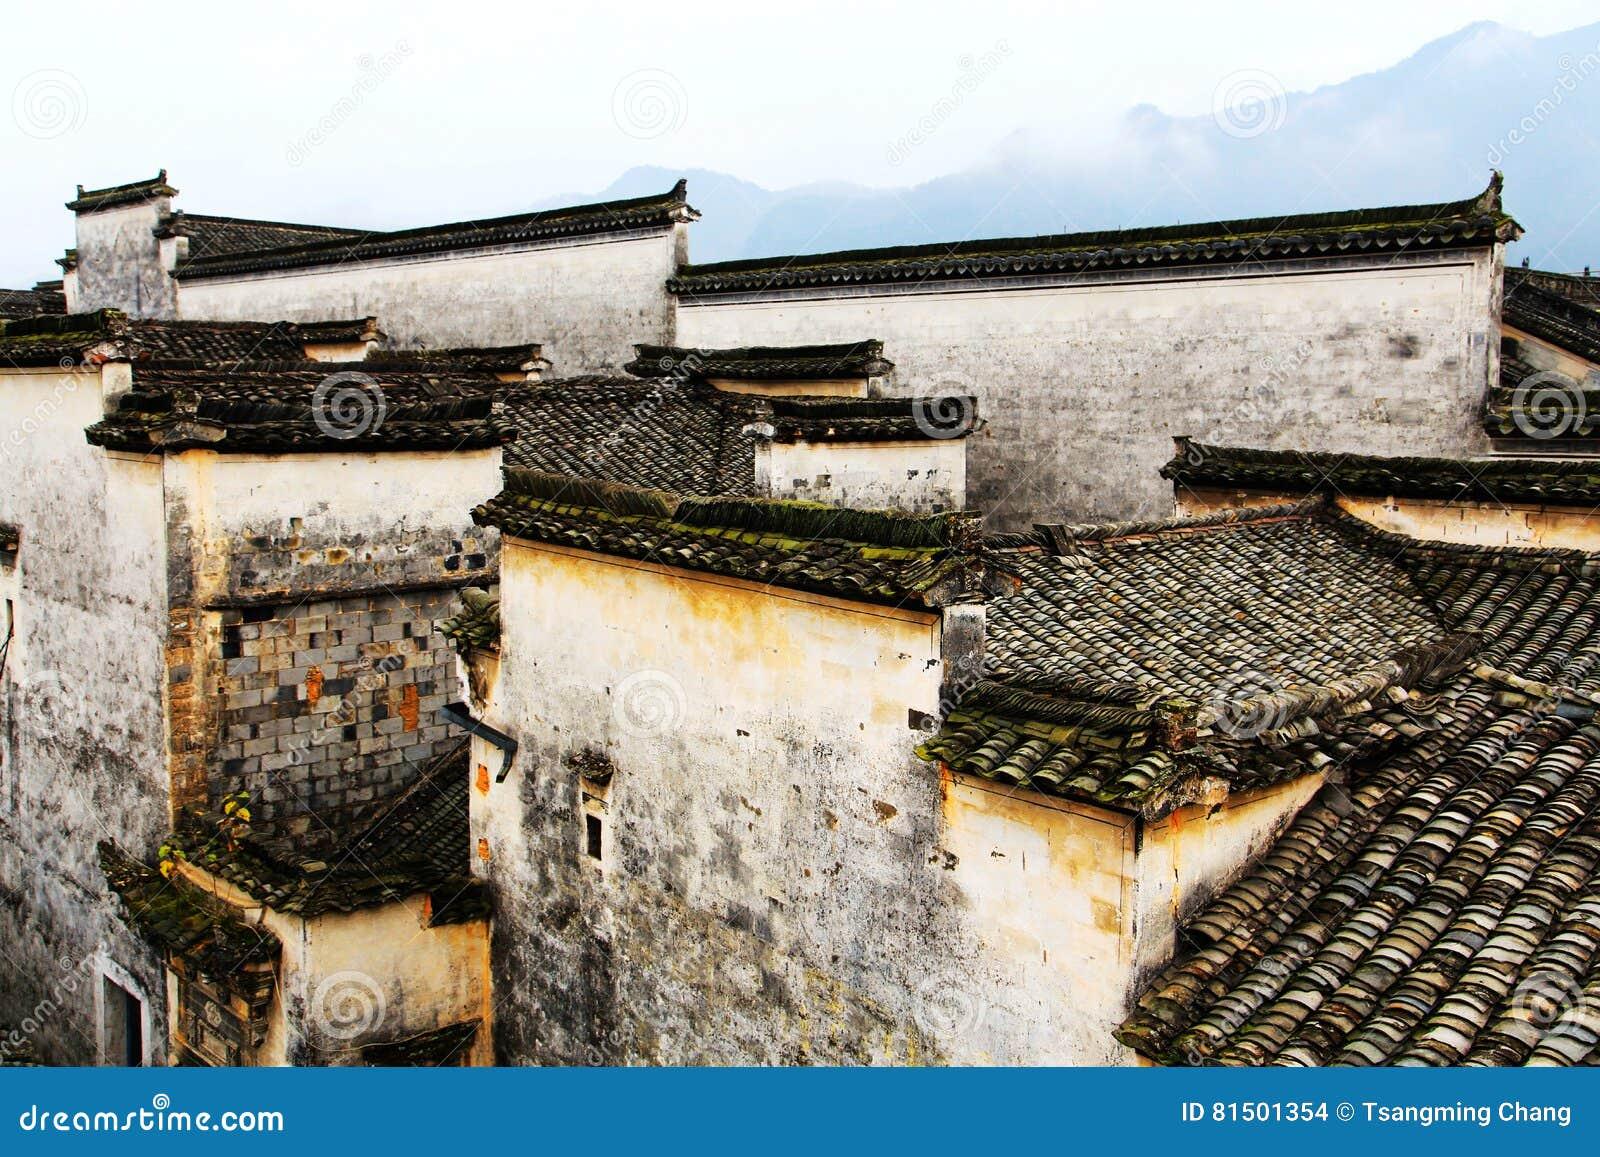 Nanping-Dorf, eine berühmte Huizhou-Art alte Architektur in China